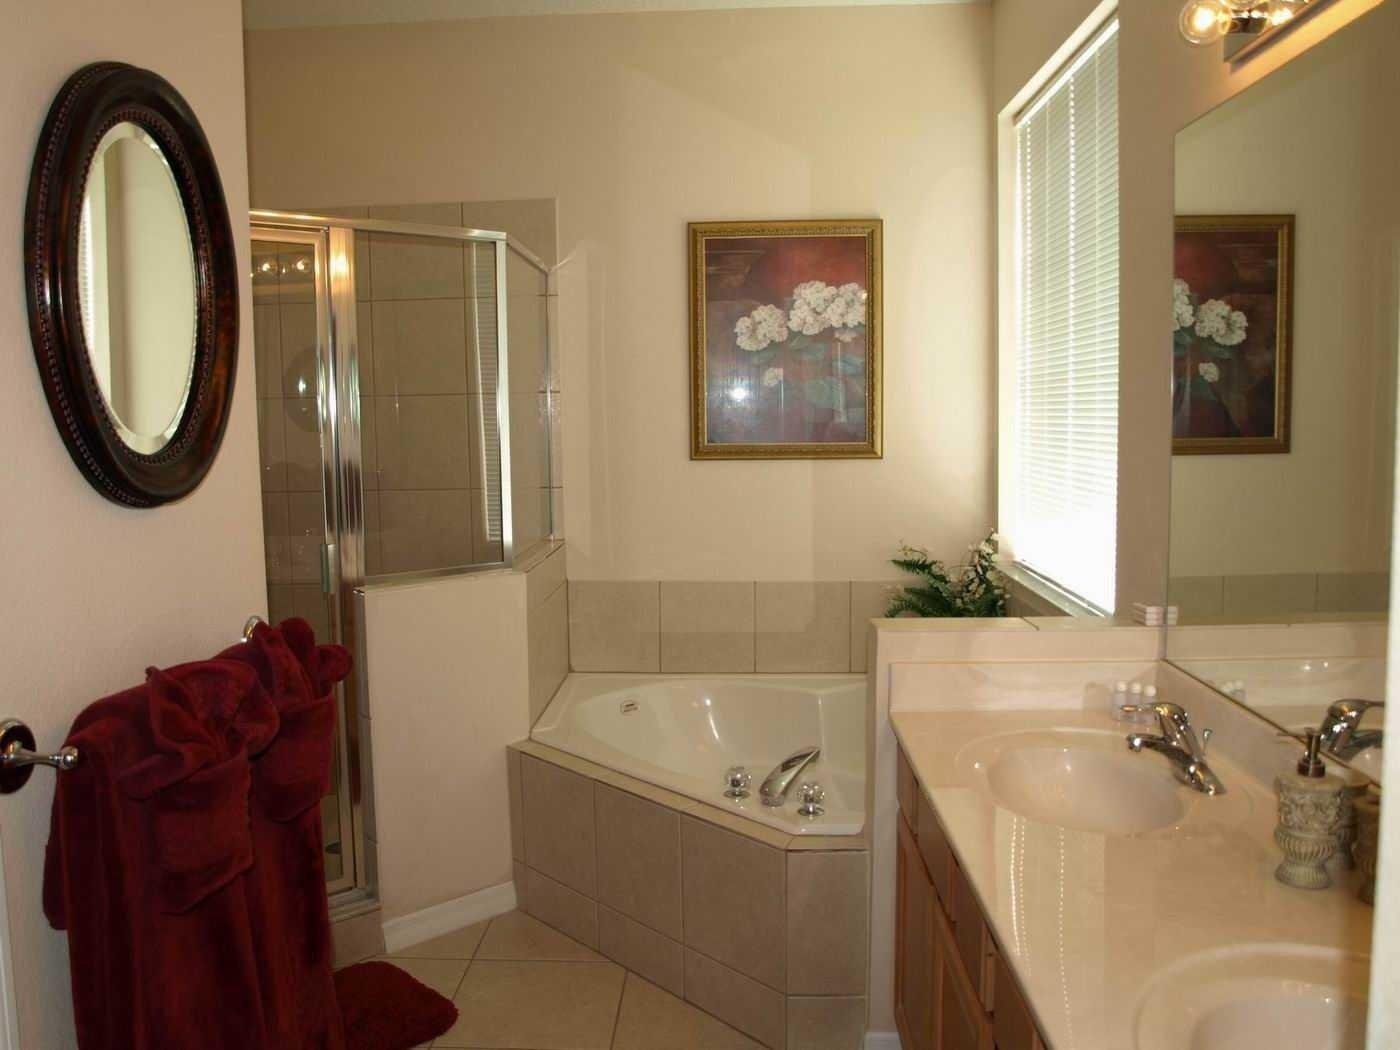 10 Stylish Master Bedroom And Bathroom Ideas colors for master bedroom and bathroom fantinidesigns 2021